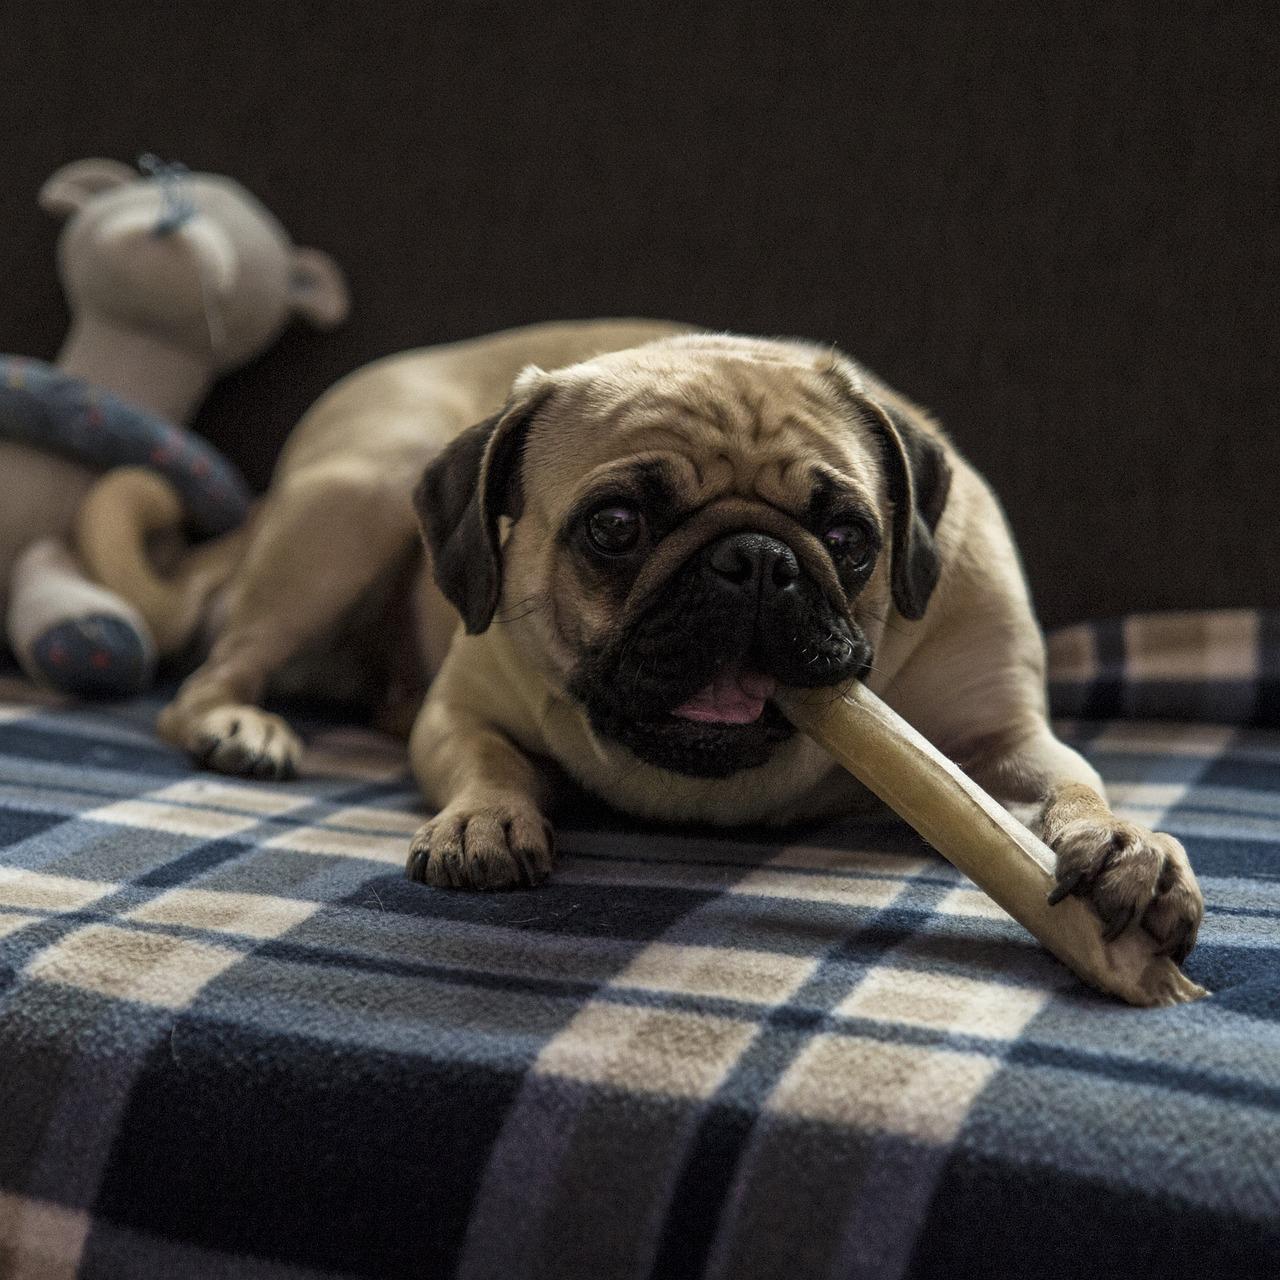 Pug chews on a dog treat